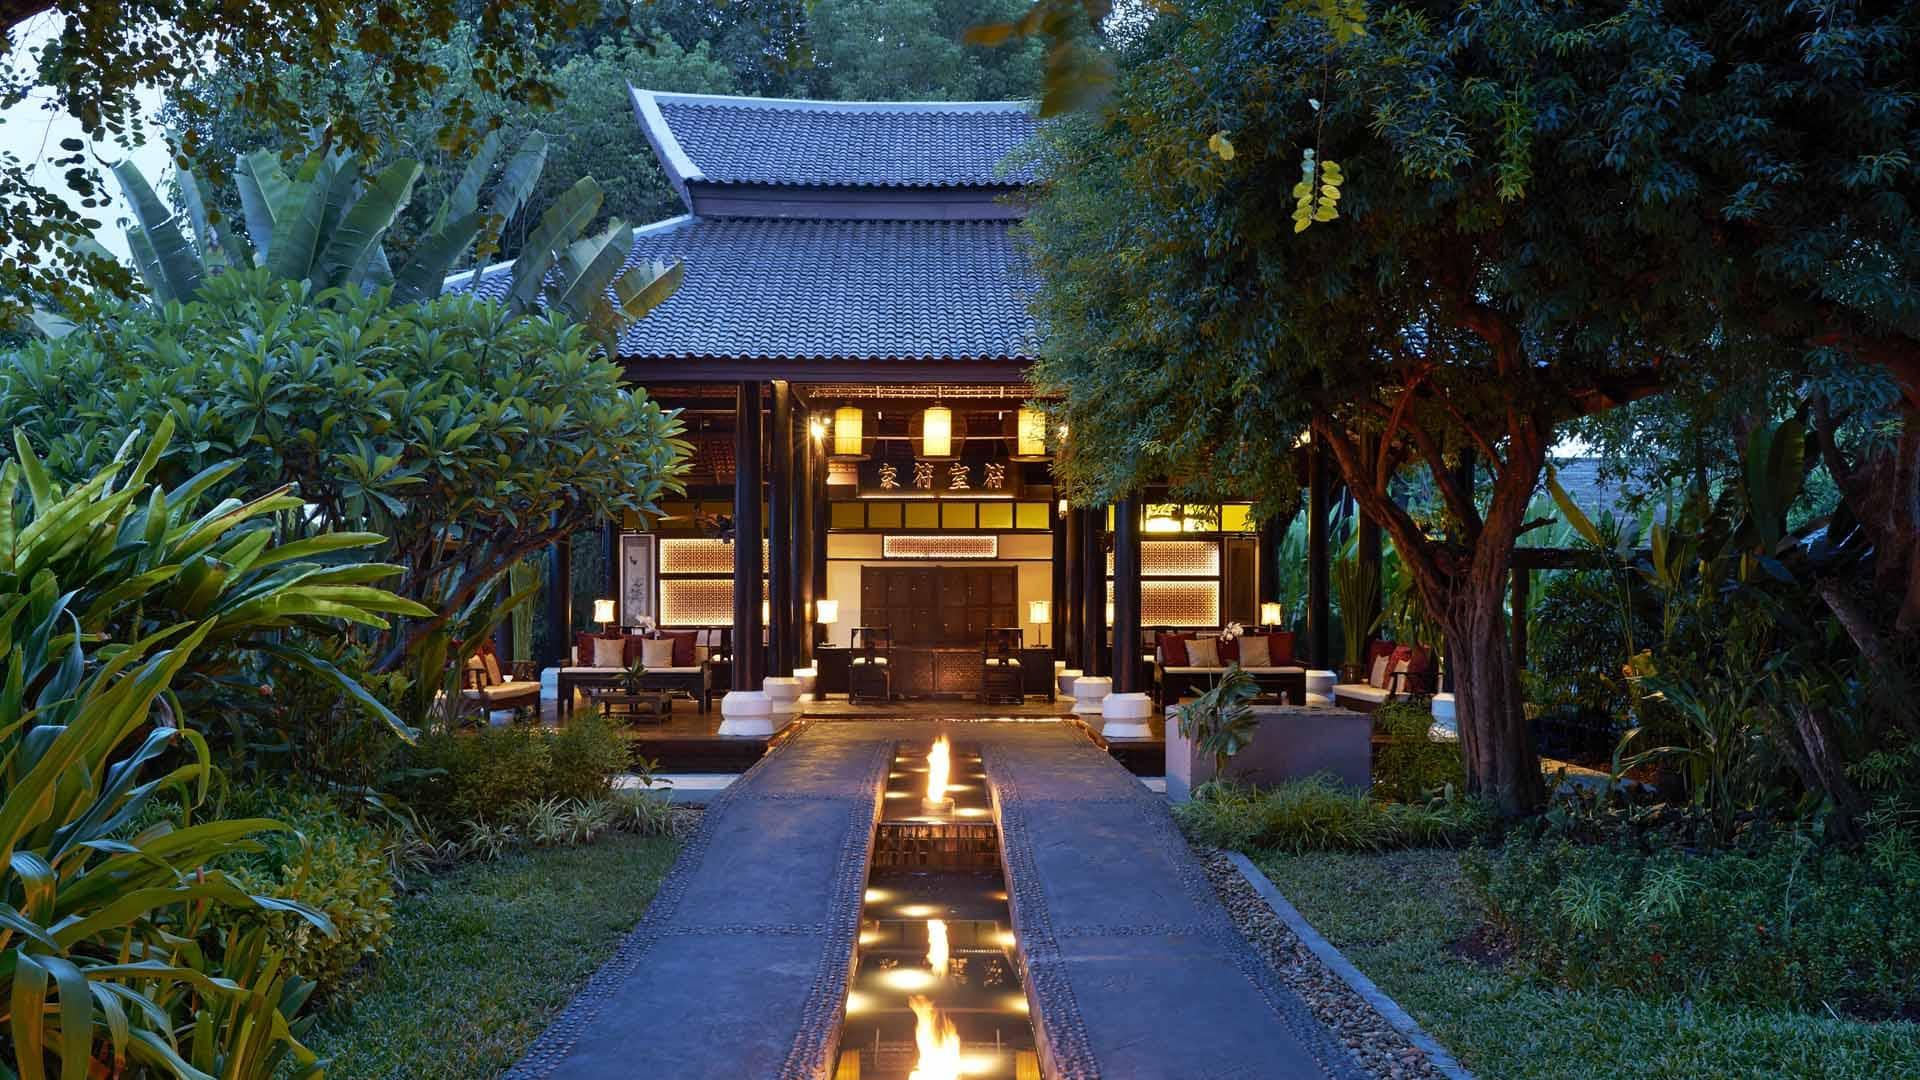 https://assets.anantara.com/image/upload/q_auto/media/minor/anantara/images/anantara-lawana-koh-samui-resort/the-resort/desktop-banner/anantara_lawana_lobby_header_1920x1080.jpg